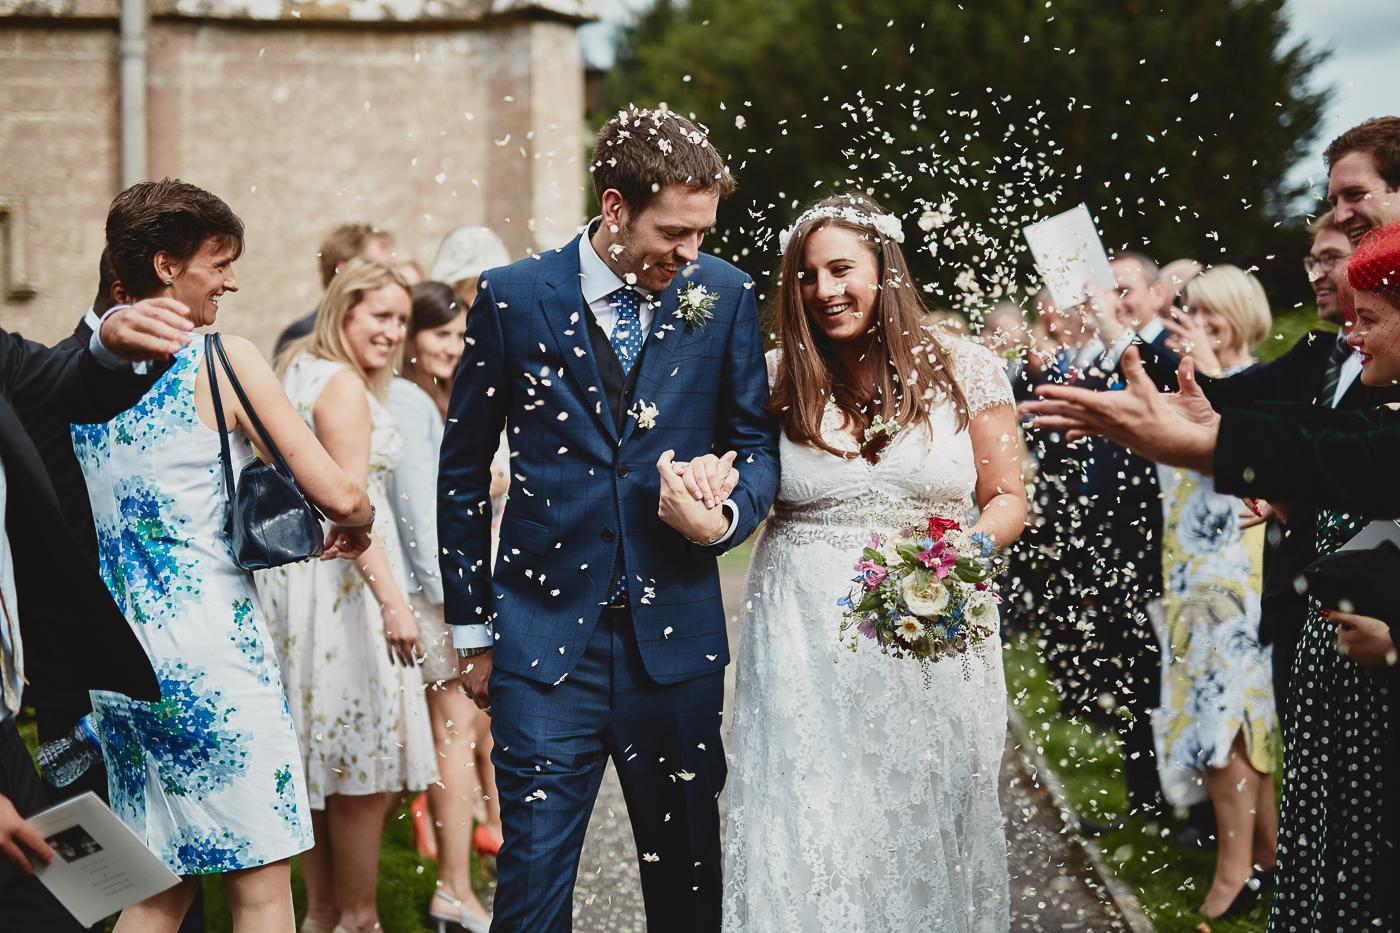 Danni_And_Jack_Gloucester_Wedding-78.jpg